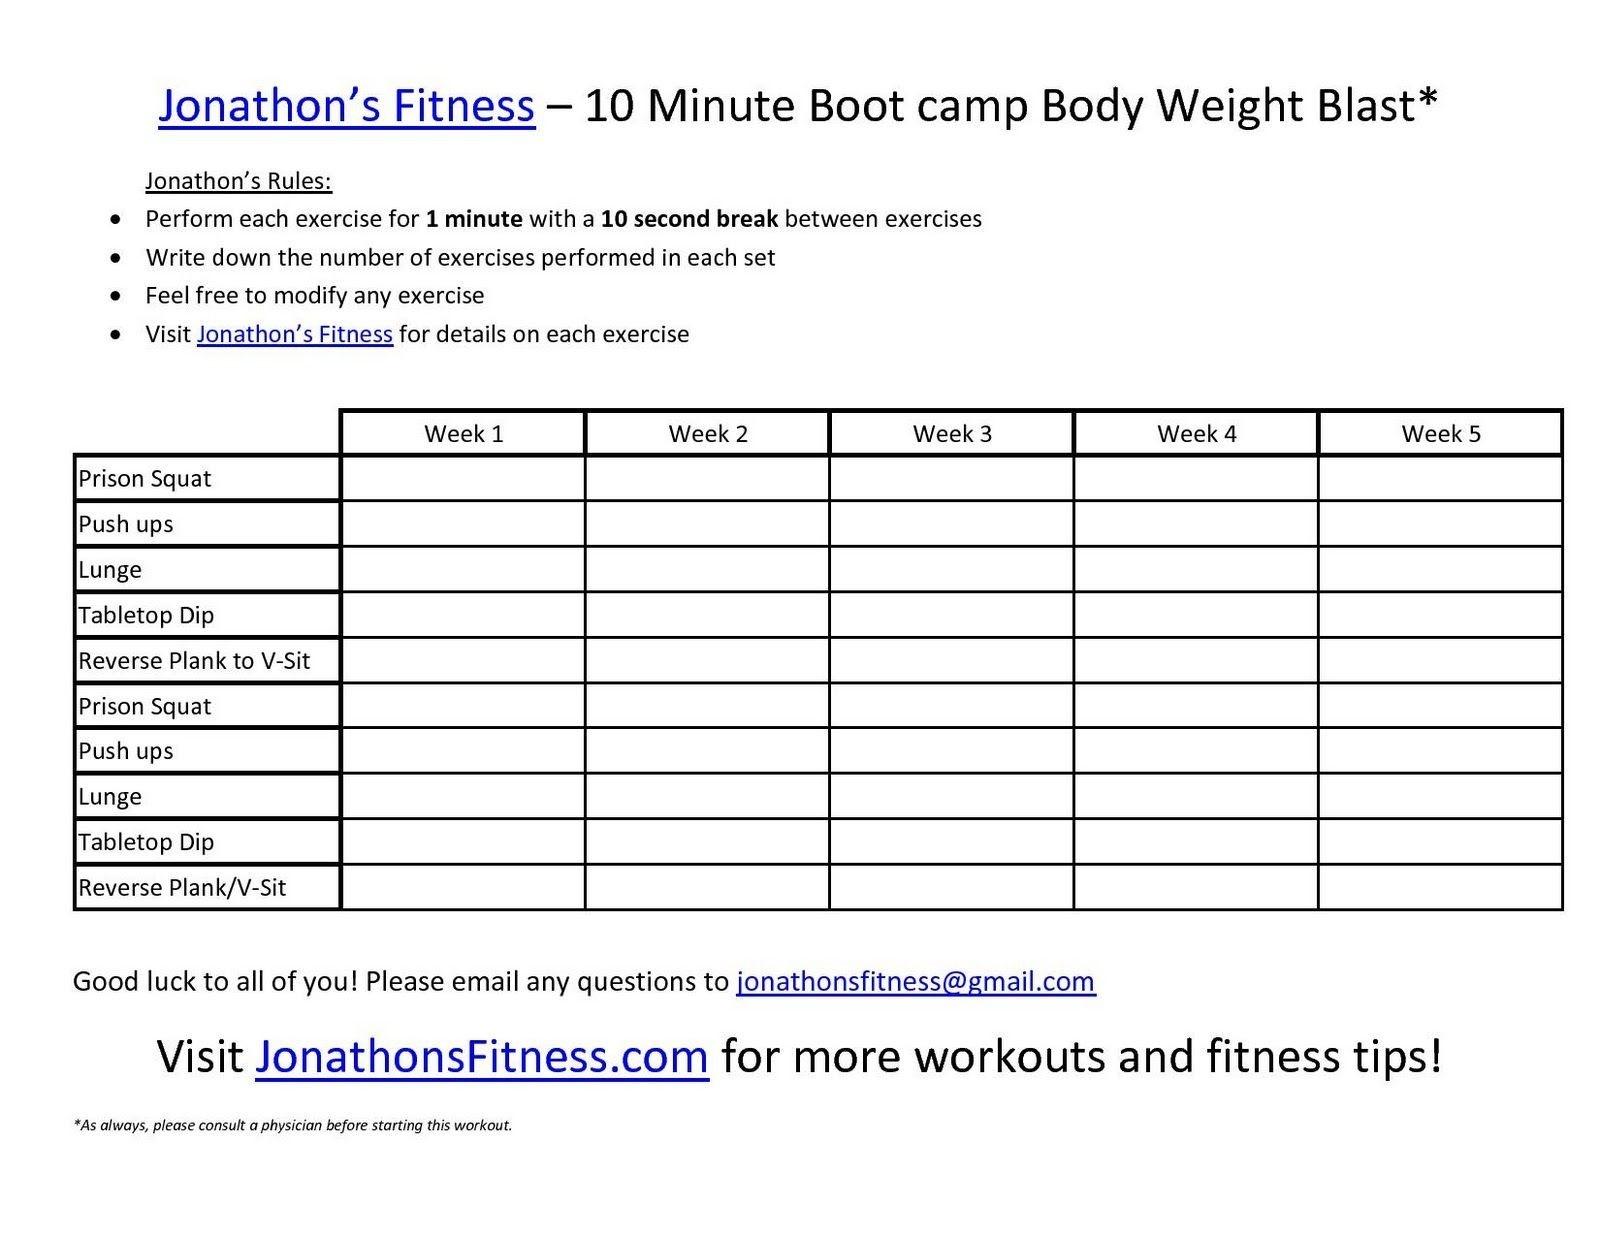 New Printable Work Out Routines   Mavensocial.co - Free Printable Gym Workout Routines